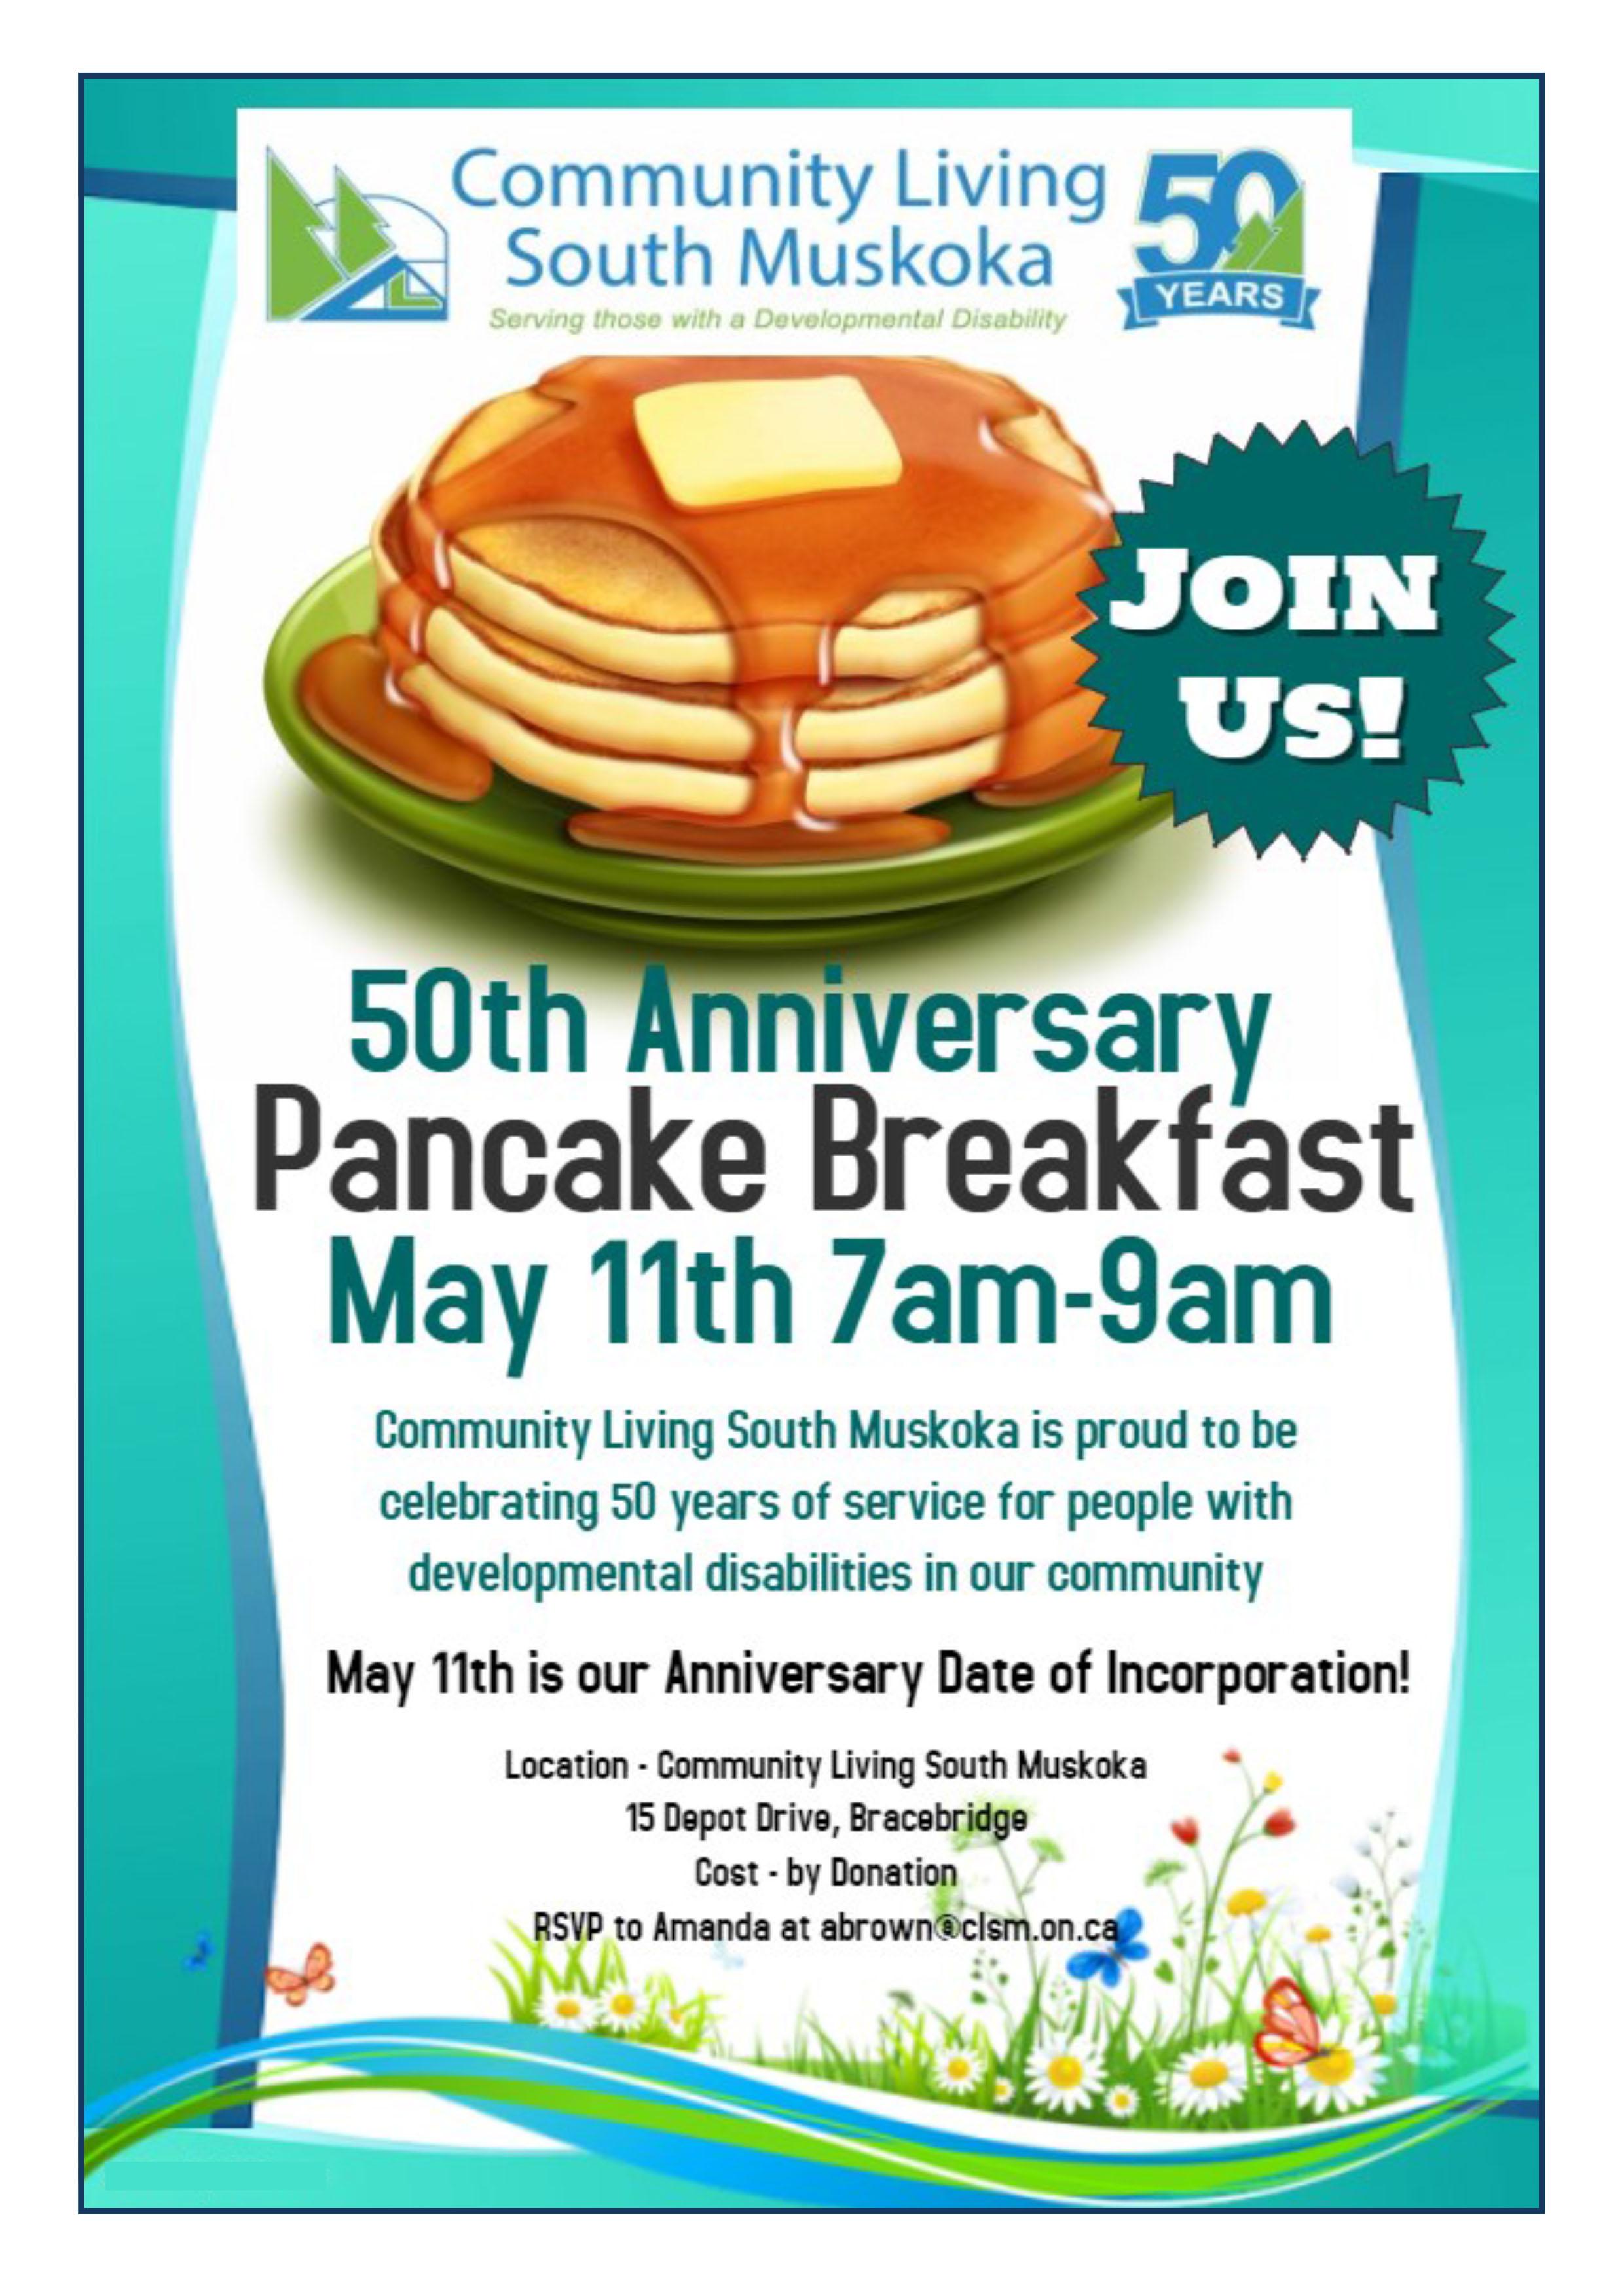 Pancake Breakfast  Community Living South Muskoka